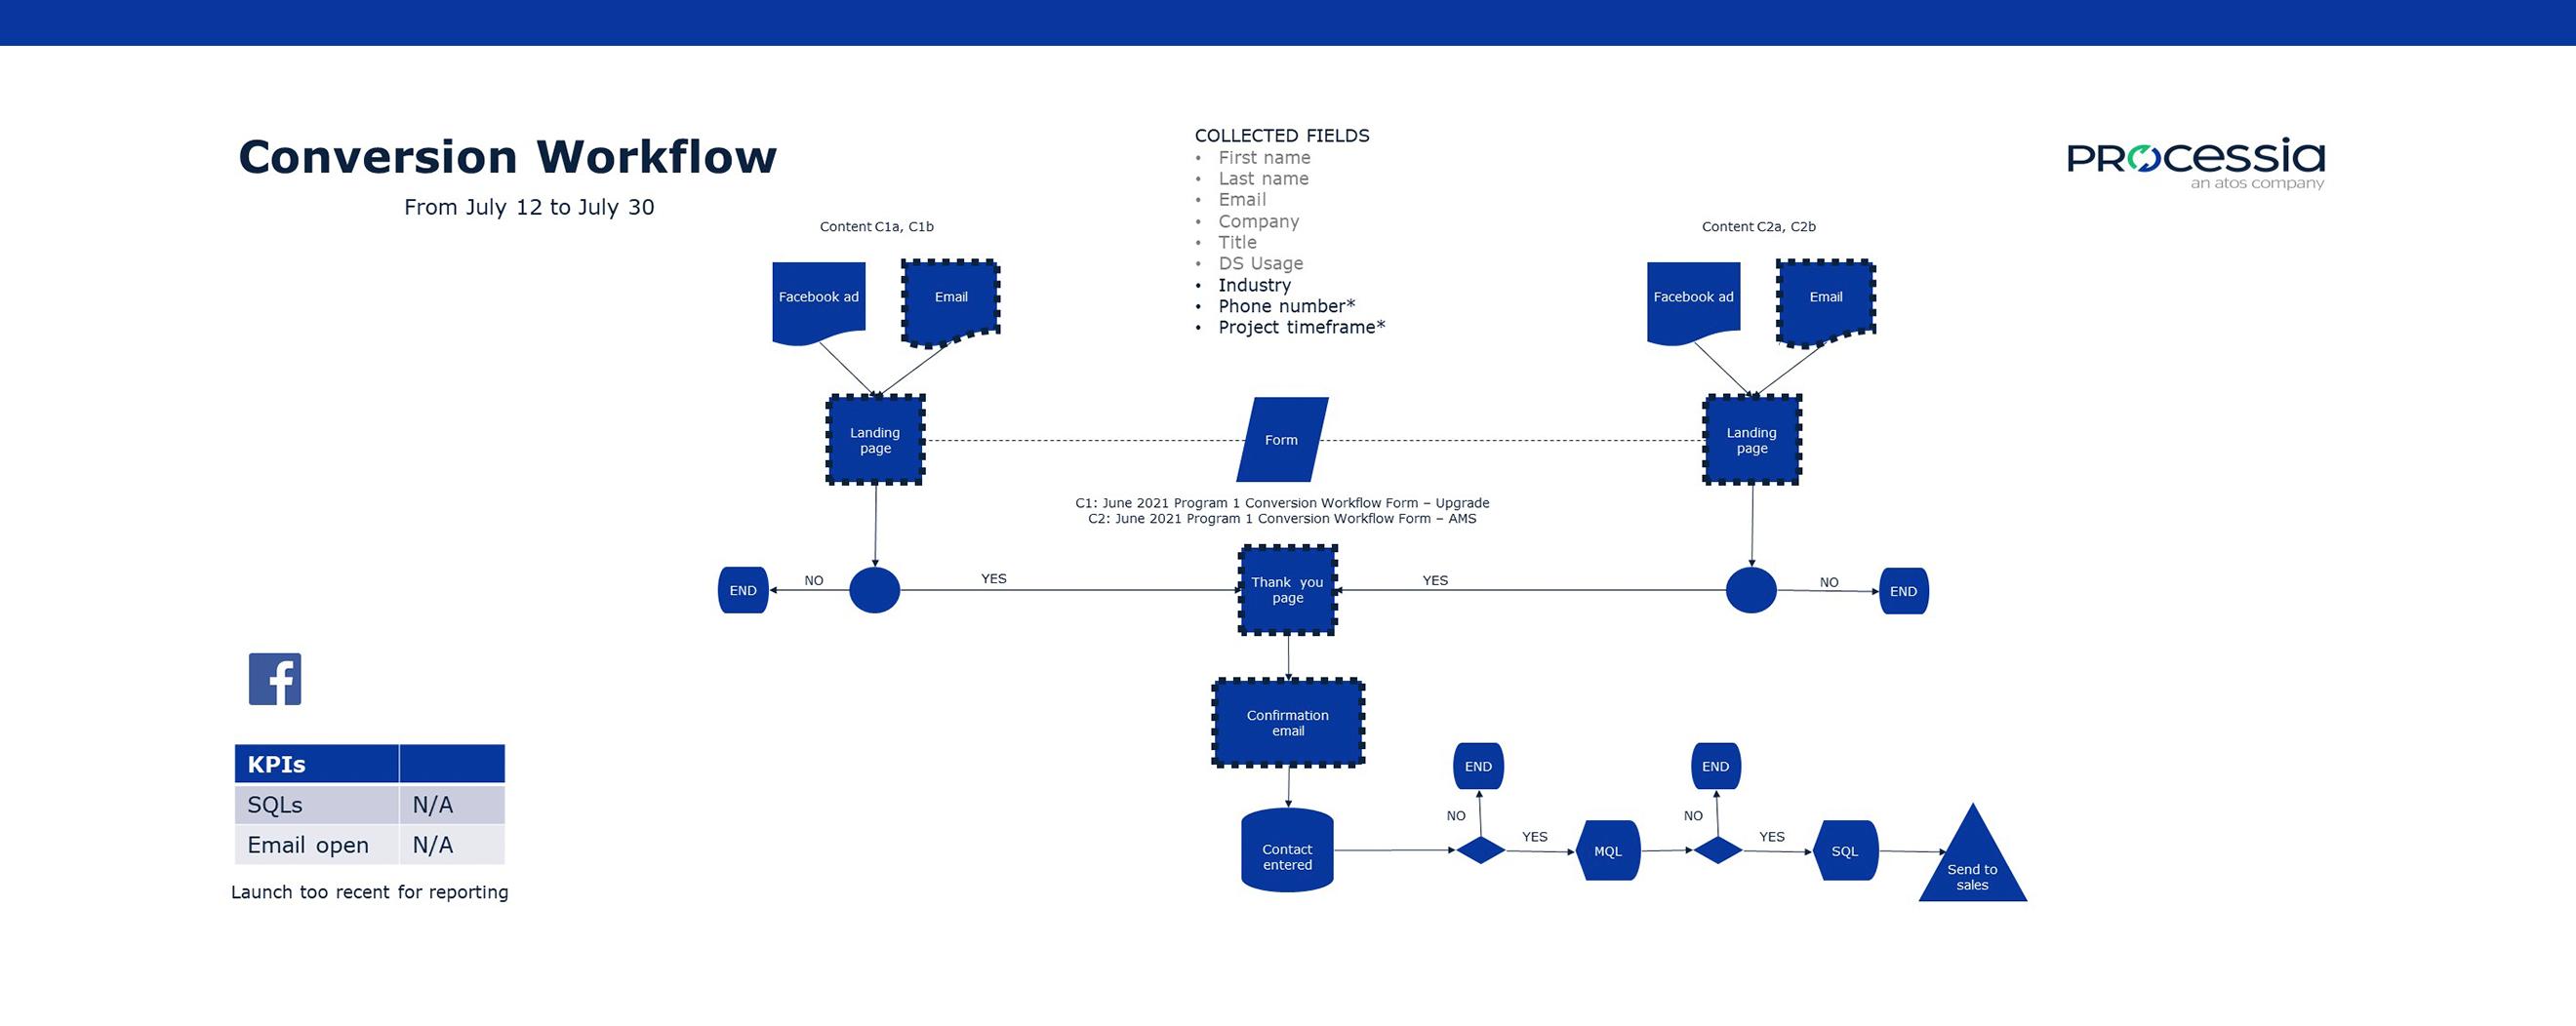 Workflow_LeadGen_Campaign_Processia